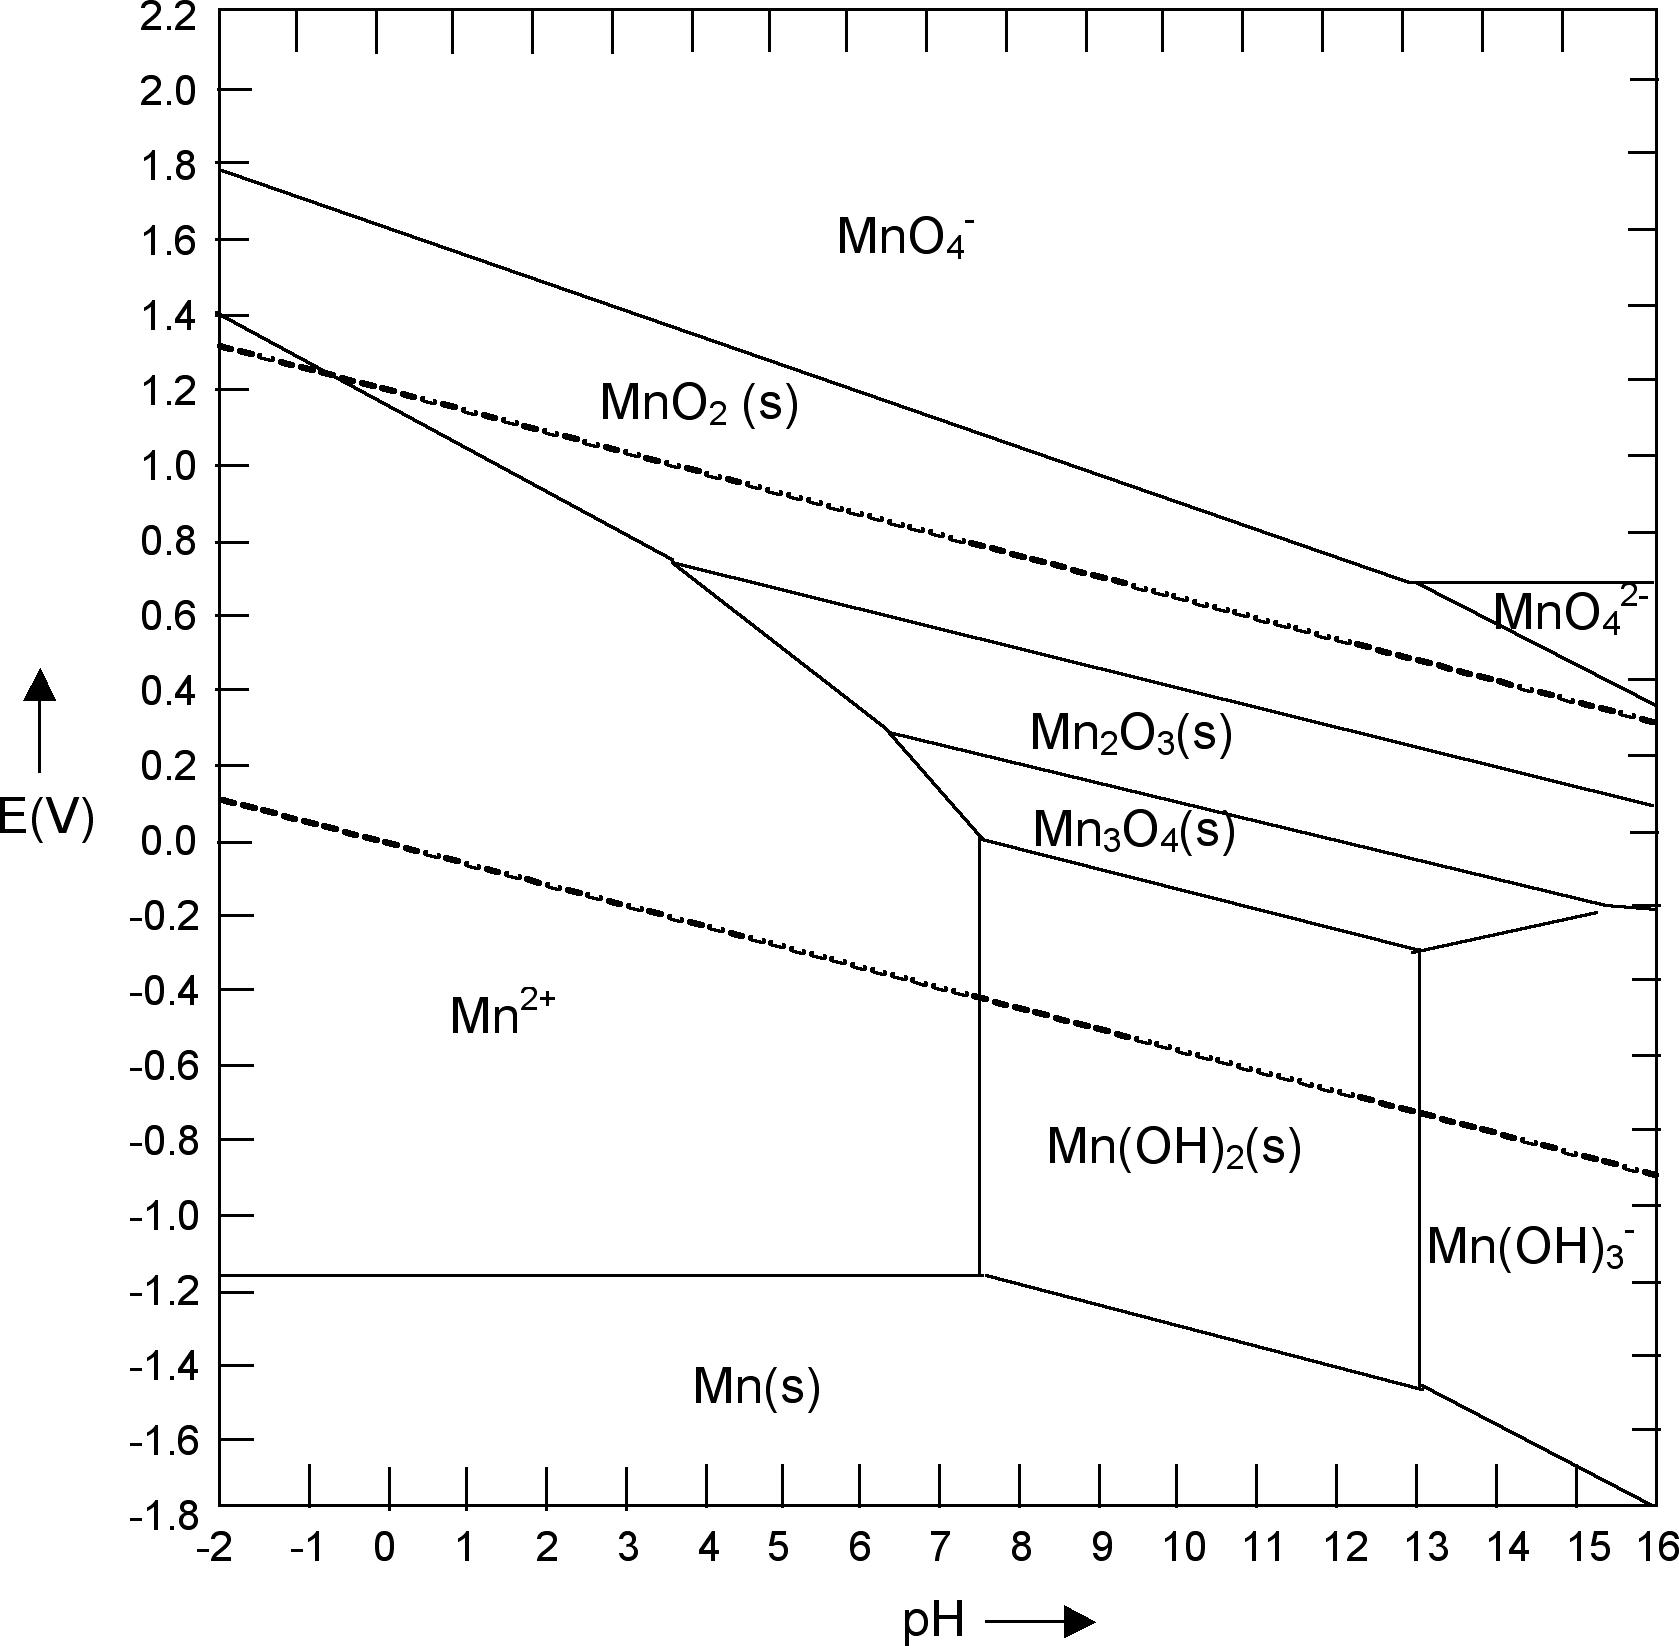 Filemn pourbaix diagramg wikimedia commons filemn pourbaix diagramg ccuart Choice Image